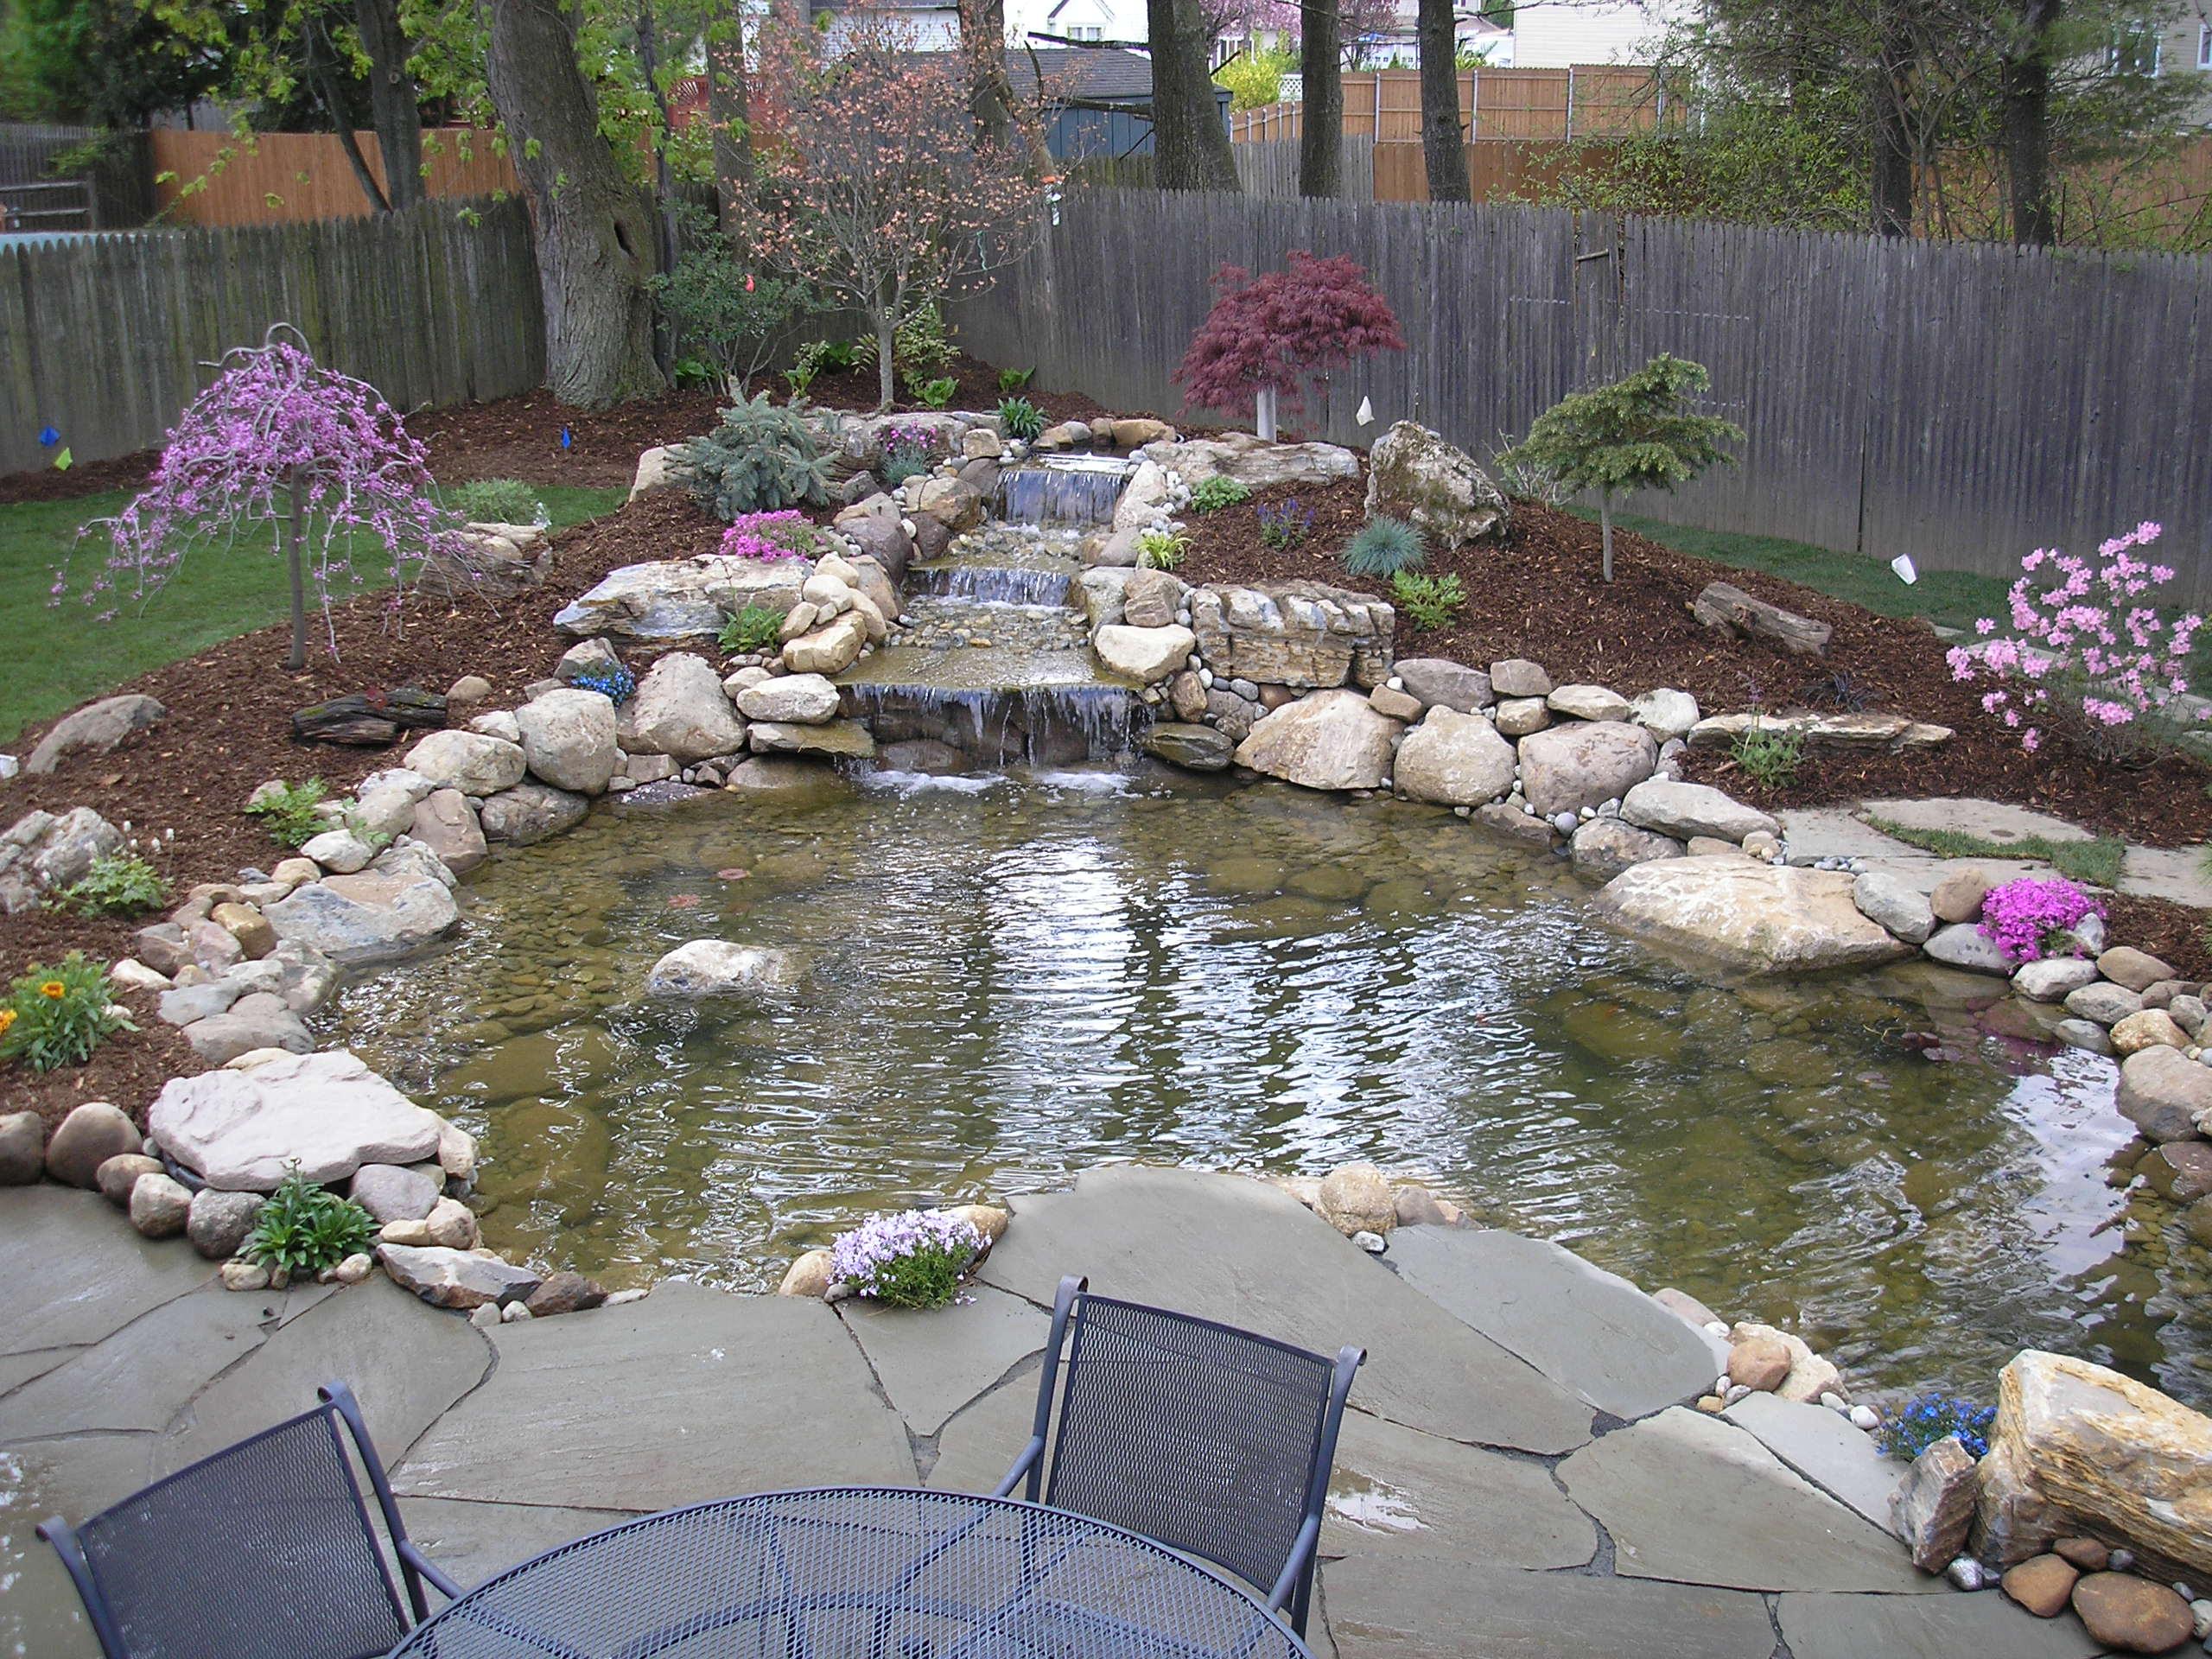 1000+ ideas about Pond Stuff on Pinterest | Koi Ponds ... on Backyard Koi Pond Designs  id=33156